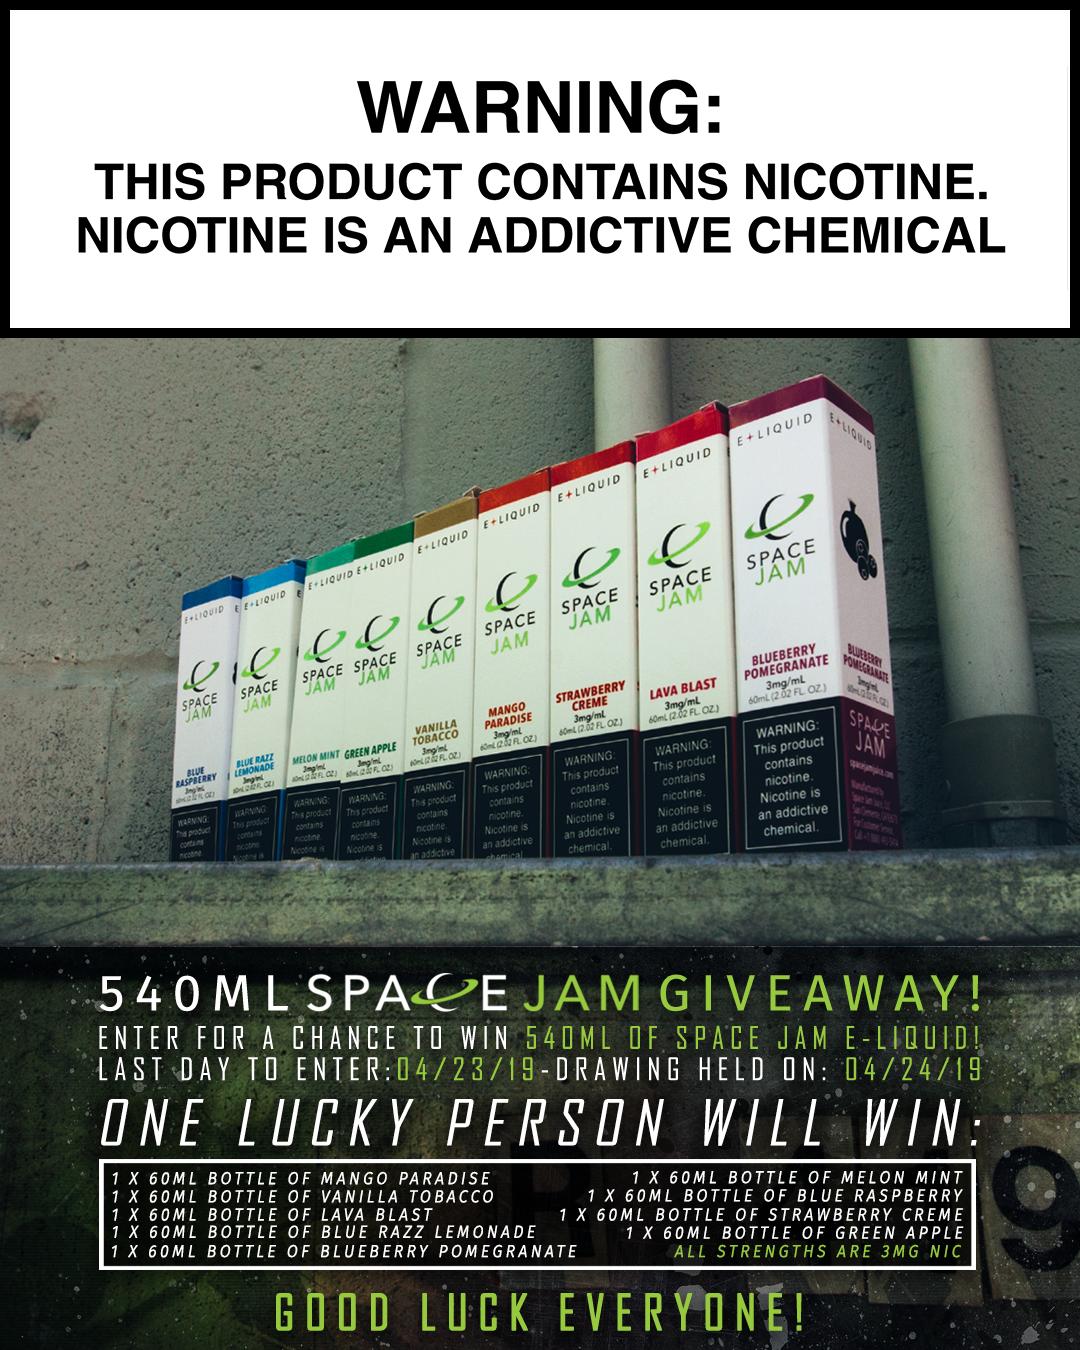 540mL Space Jam Juice Giveaway! - EVcigarettes com